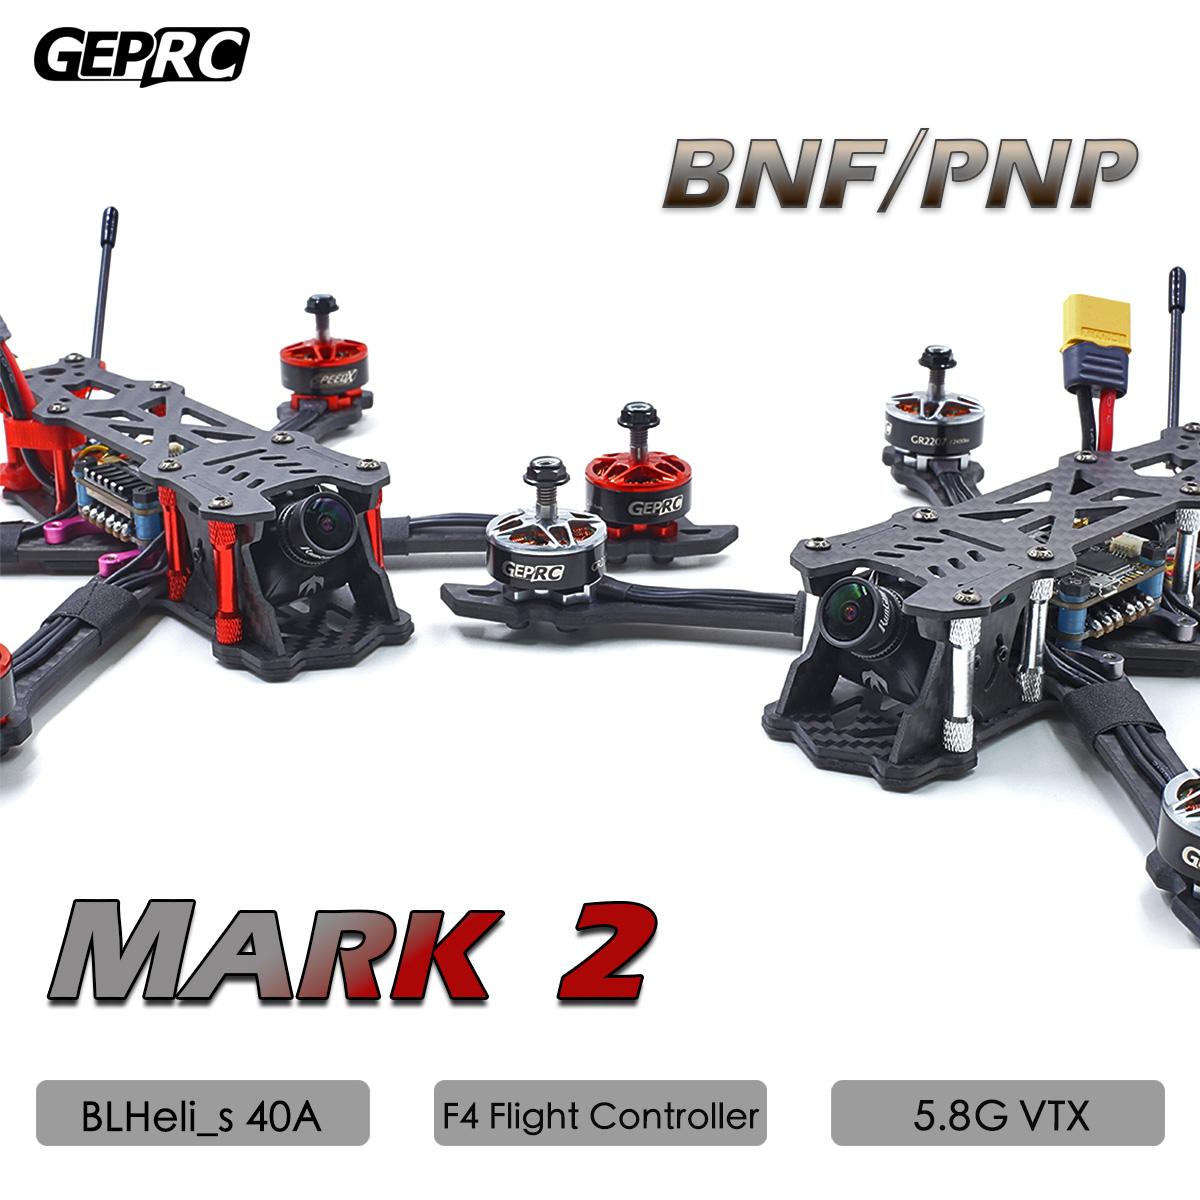 GEPRC/格普 Mark2套机5寸 BNF/PNP 竞速 Freestyle FPV穿越机整机